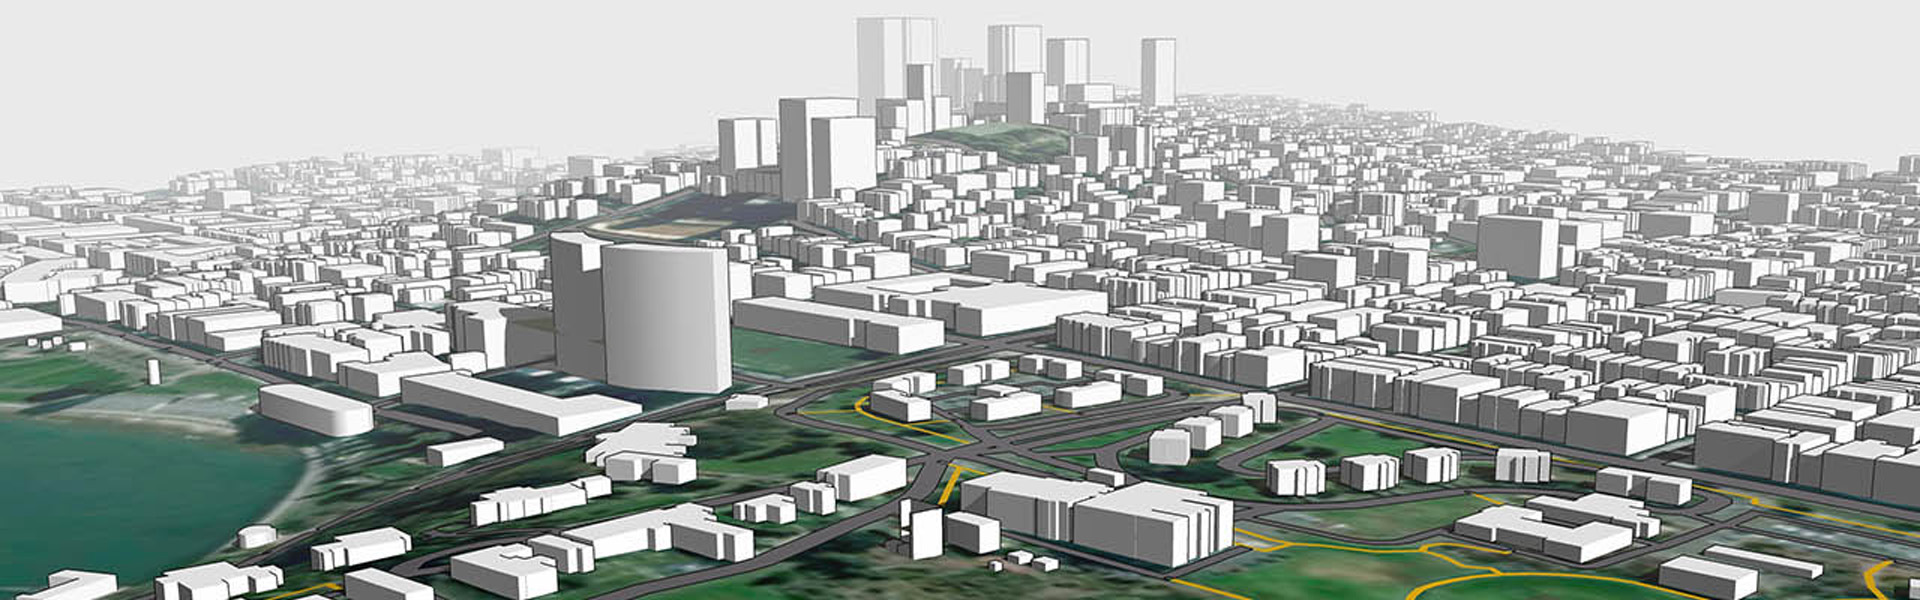 Modele urbanistyczne 3D | PlaceMaker dla SketchUp